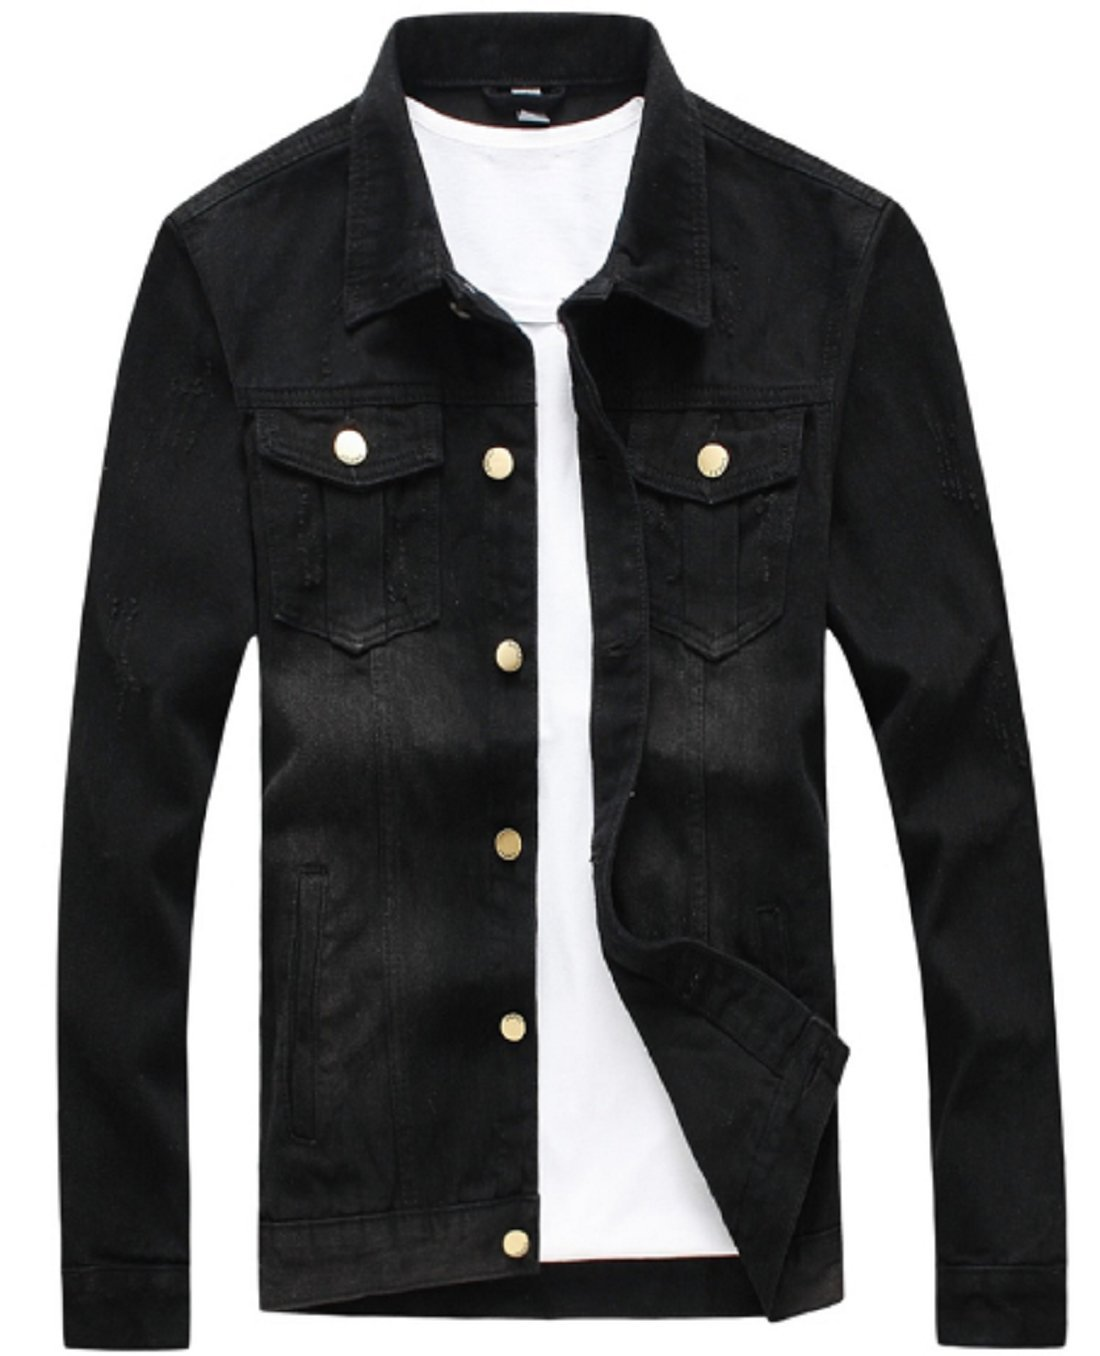 Olrek Men's Casual Wear Cotton Denim Jacket(Black,L Size)